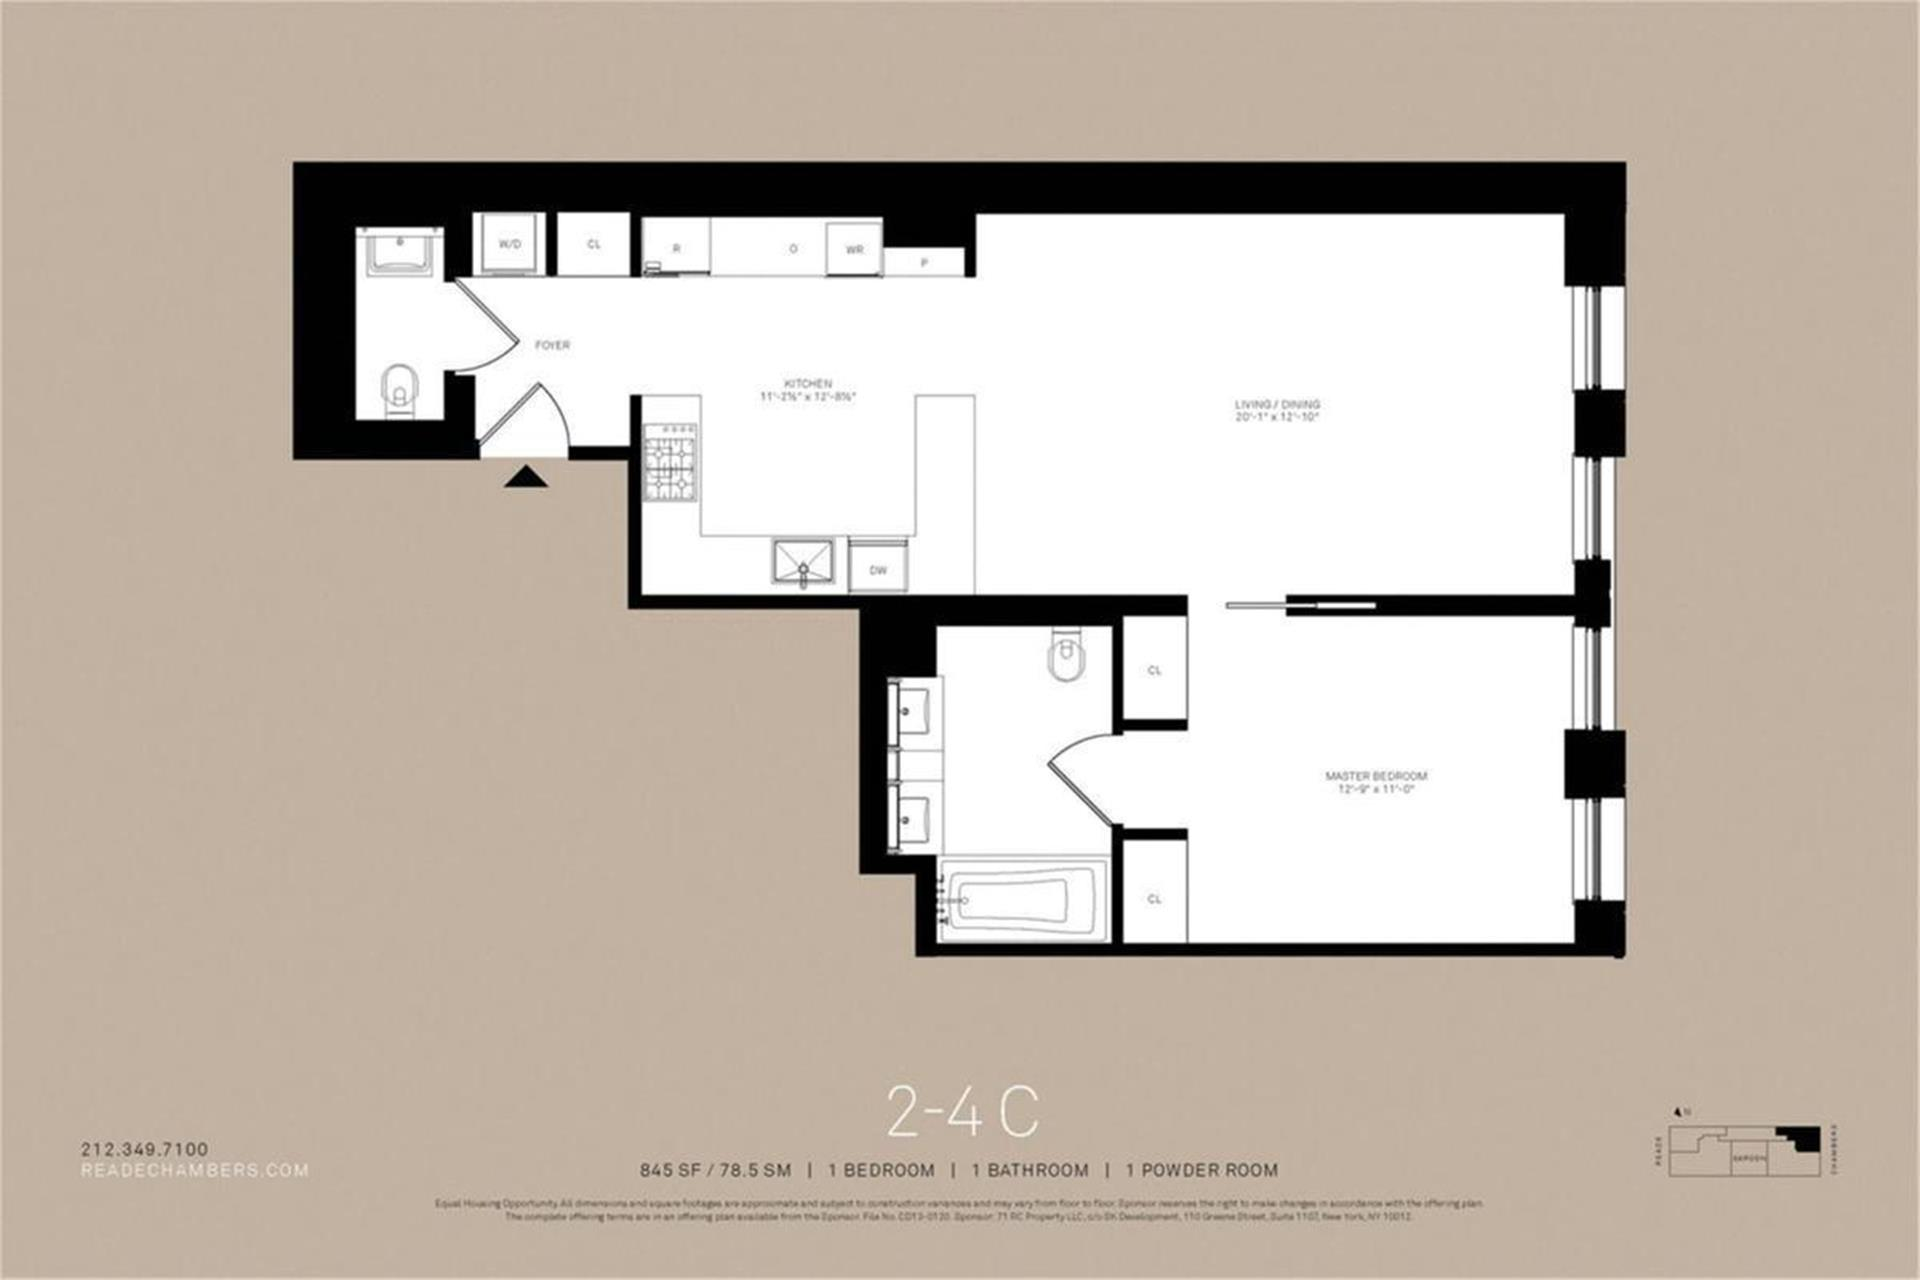 Floor plan of Reade Chambers, 71 Reade St, 4C - TriBeCa, New York